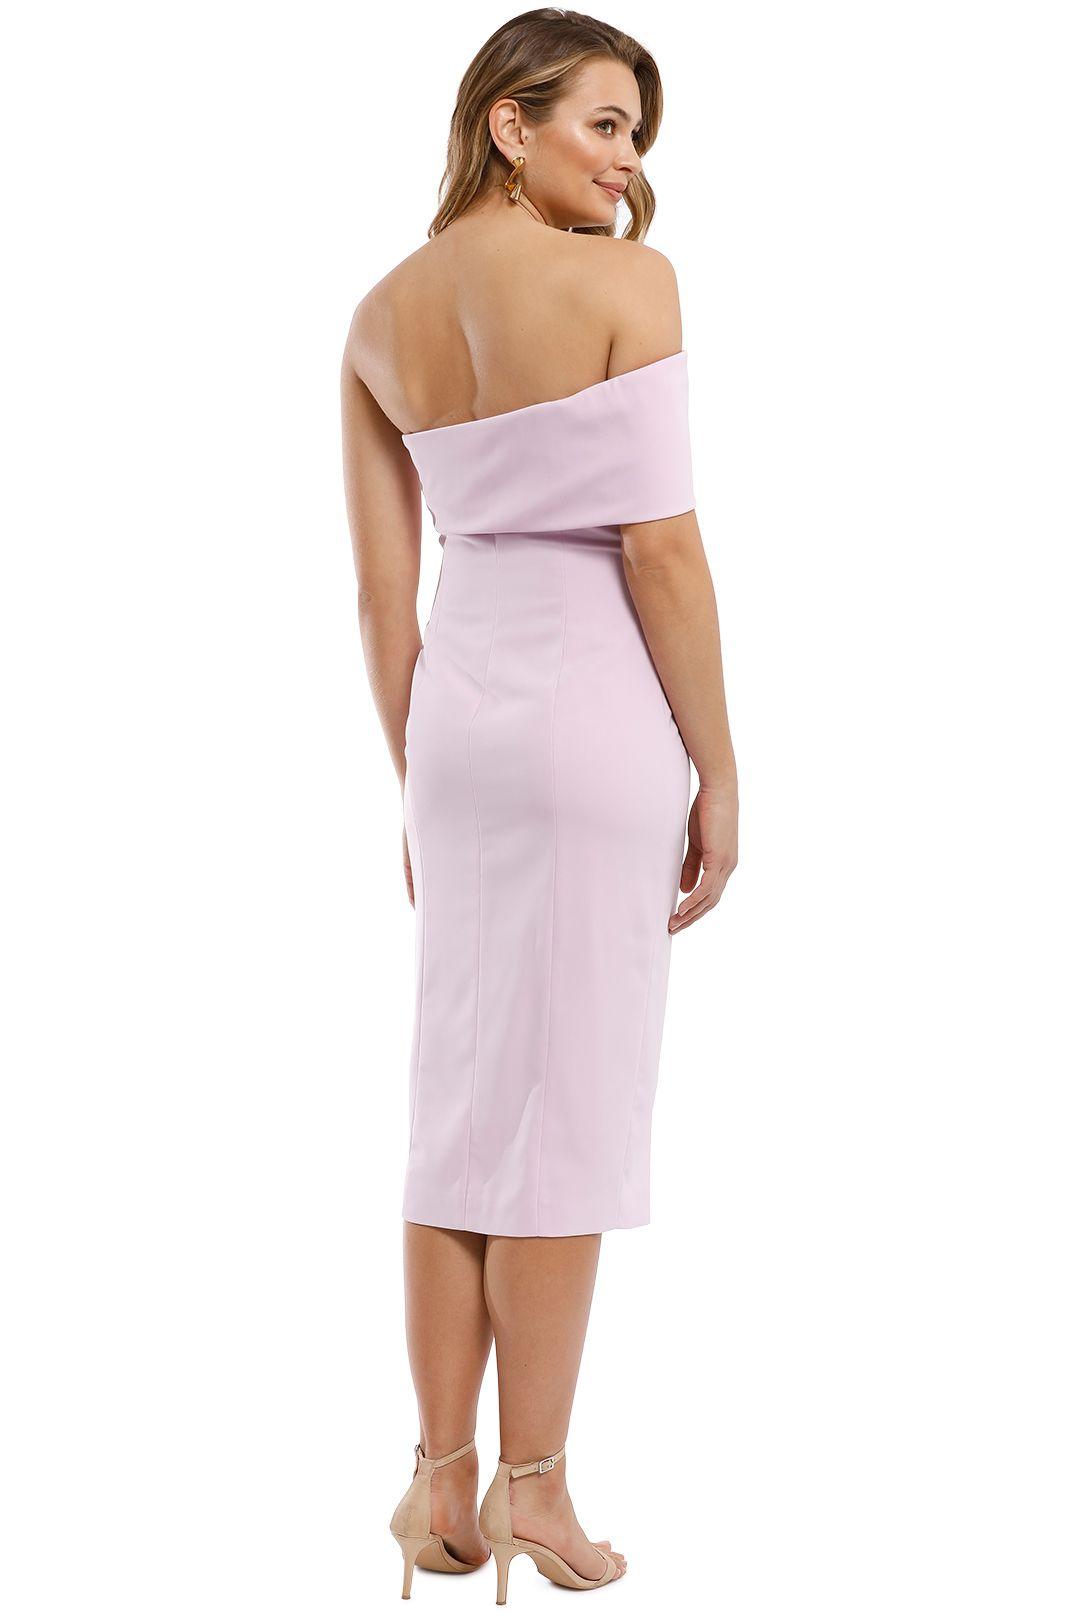 Jay Godfrey - Surrey Midi Dress - Lilac - Back